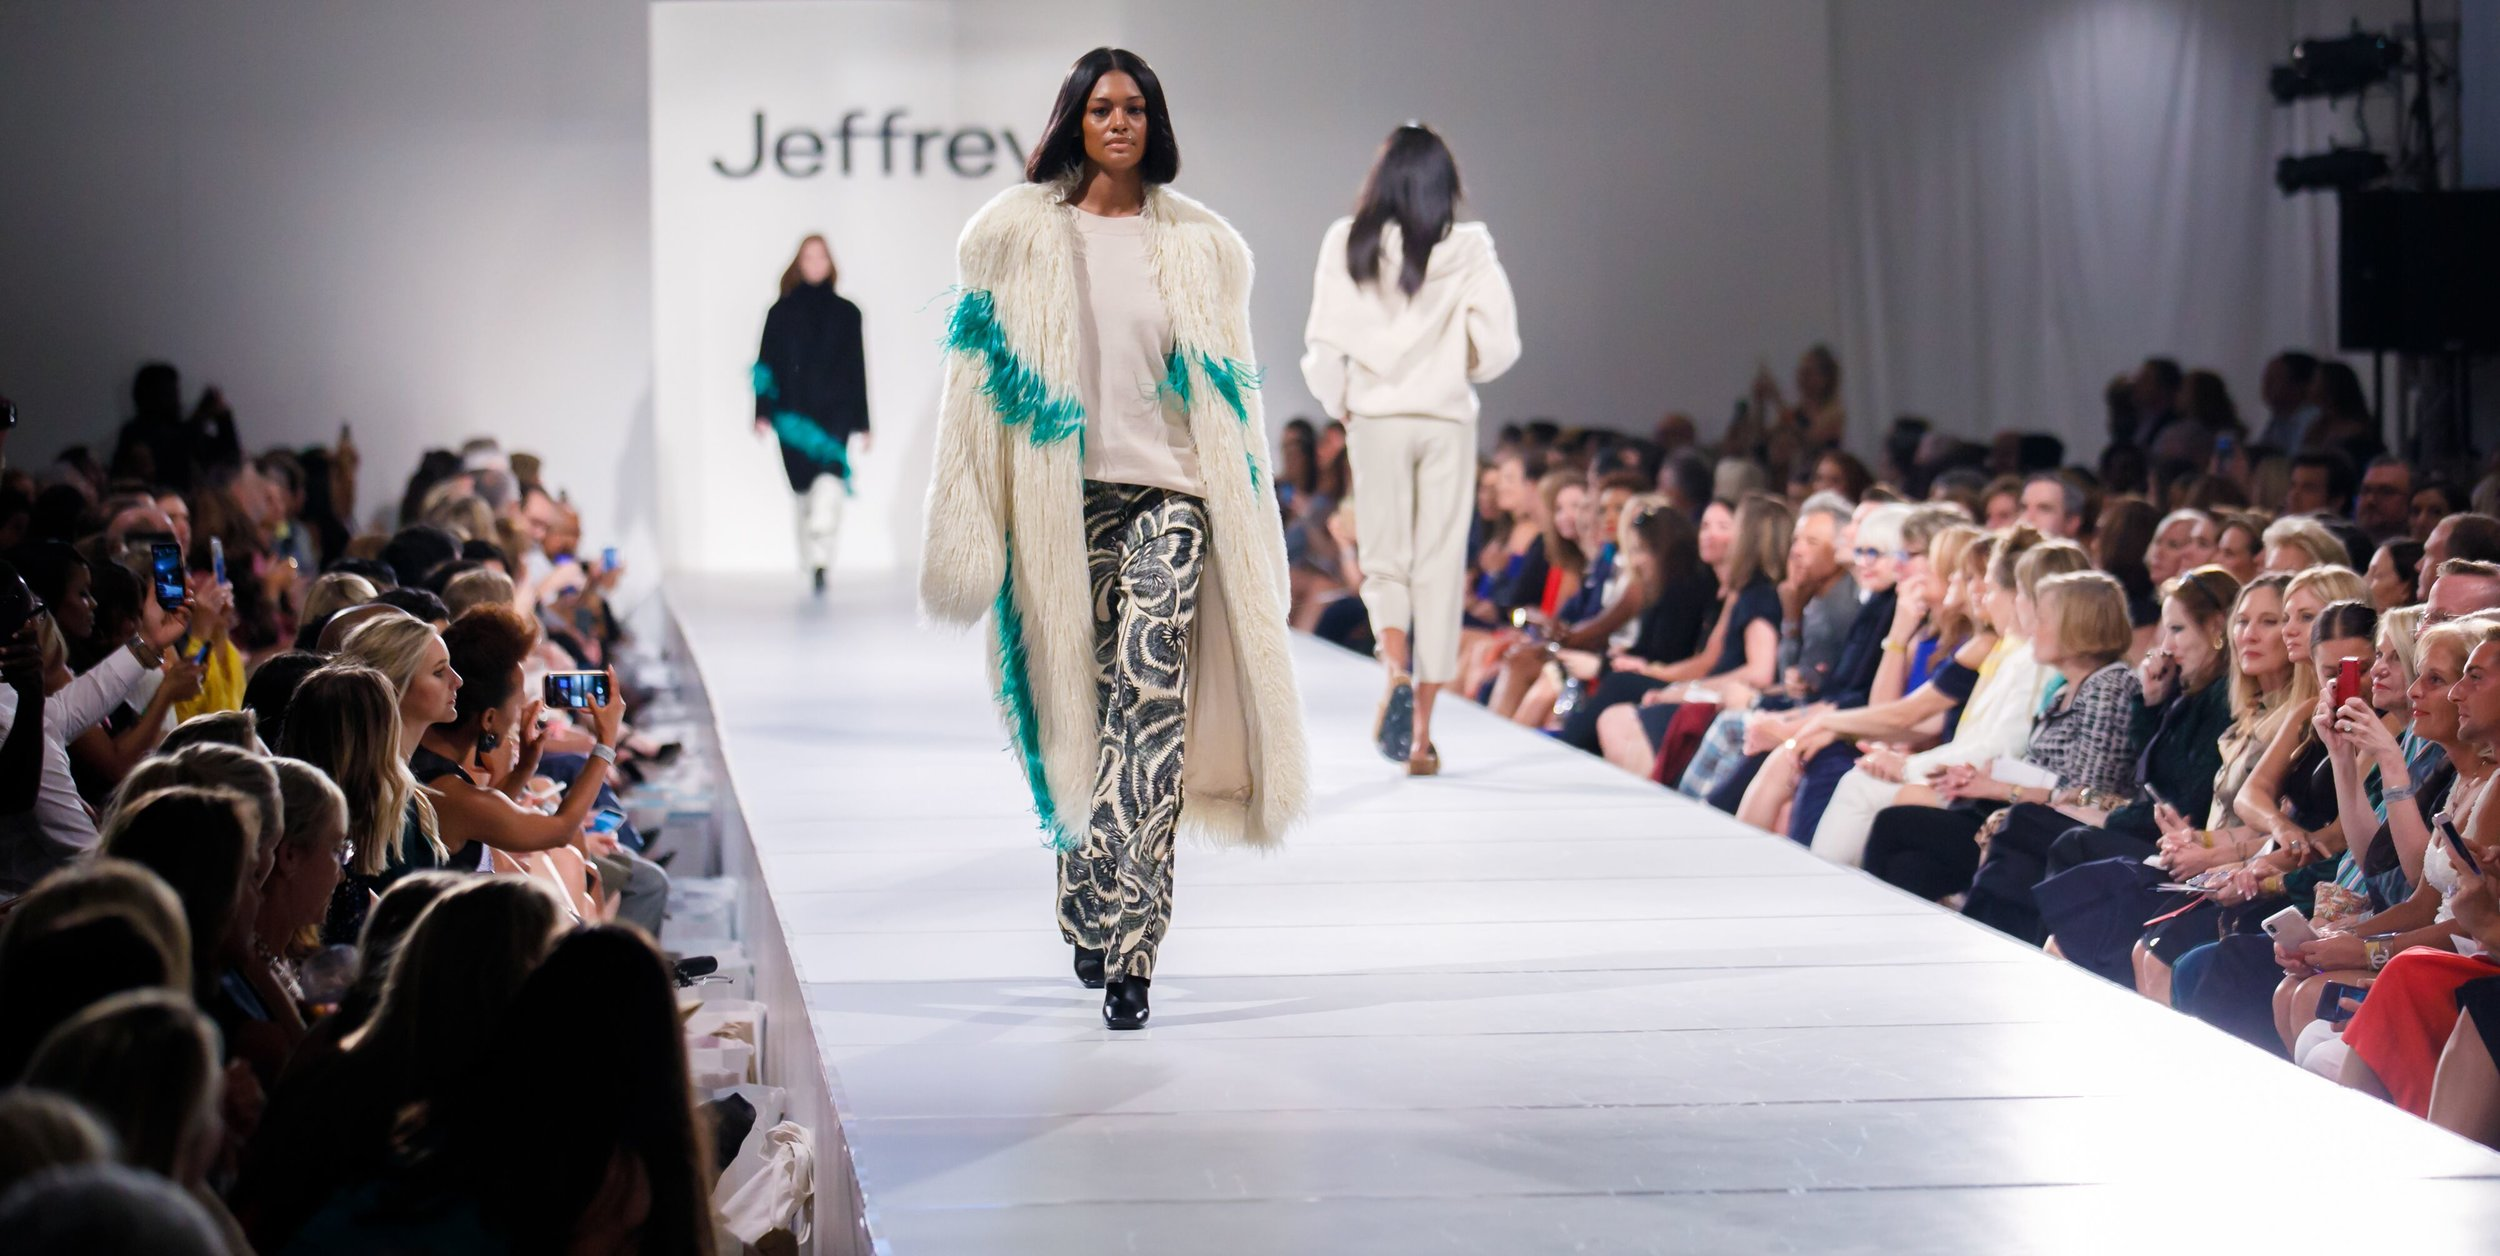 Jeffrey-Fashion-Cares